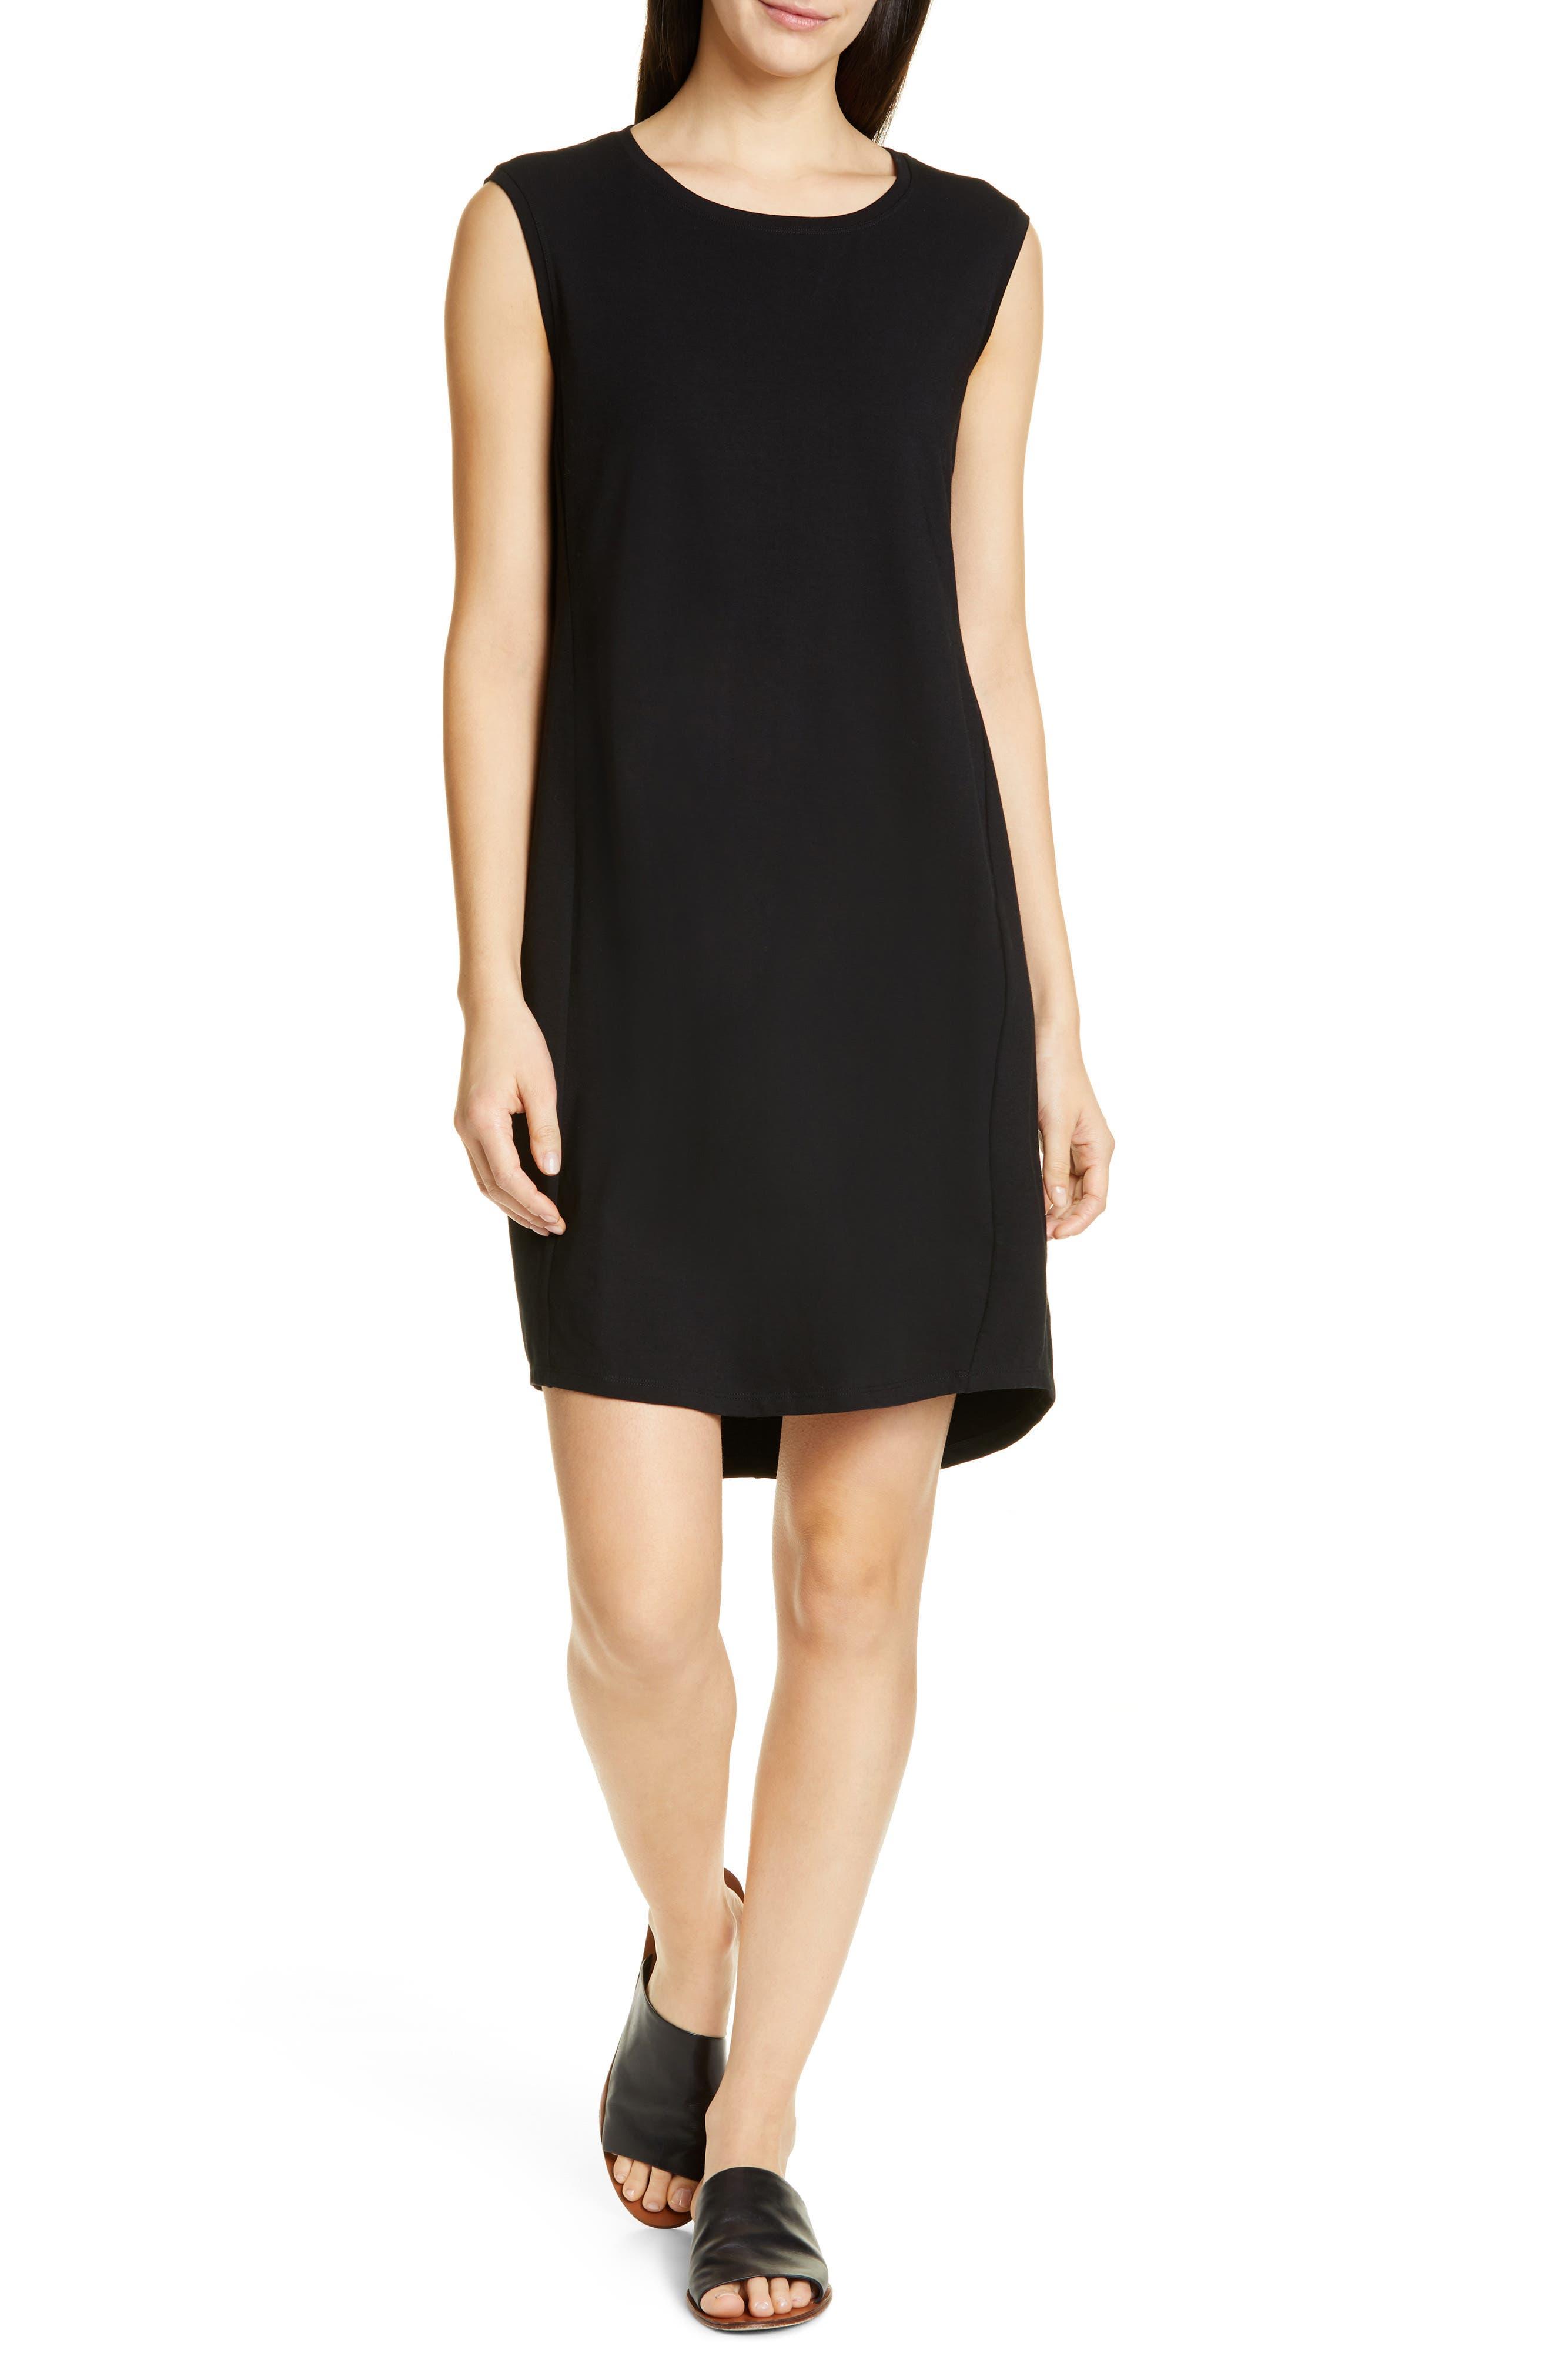 Petite Eileen Fisher Scoop Neck Sleeveless Dress, Black